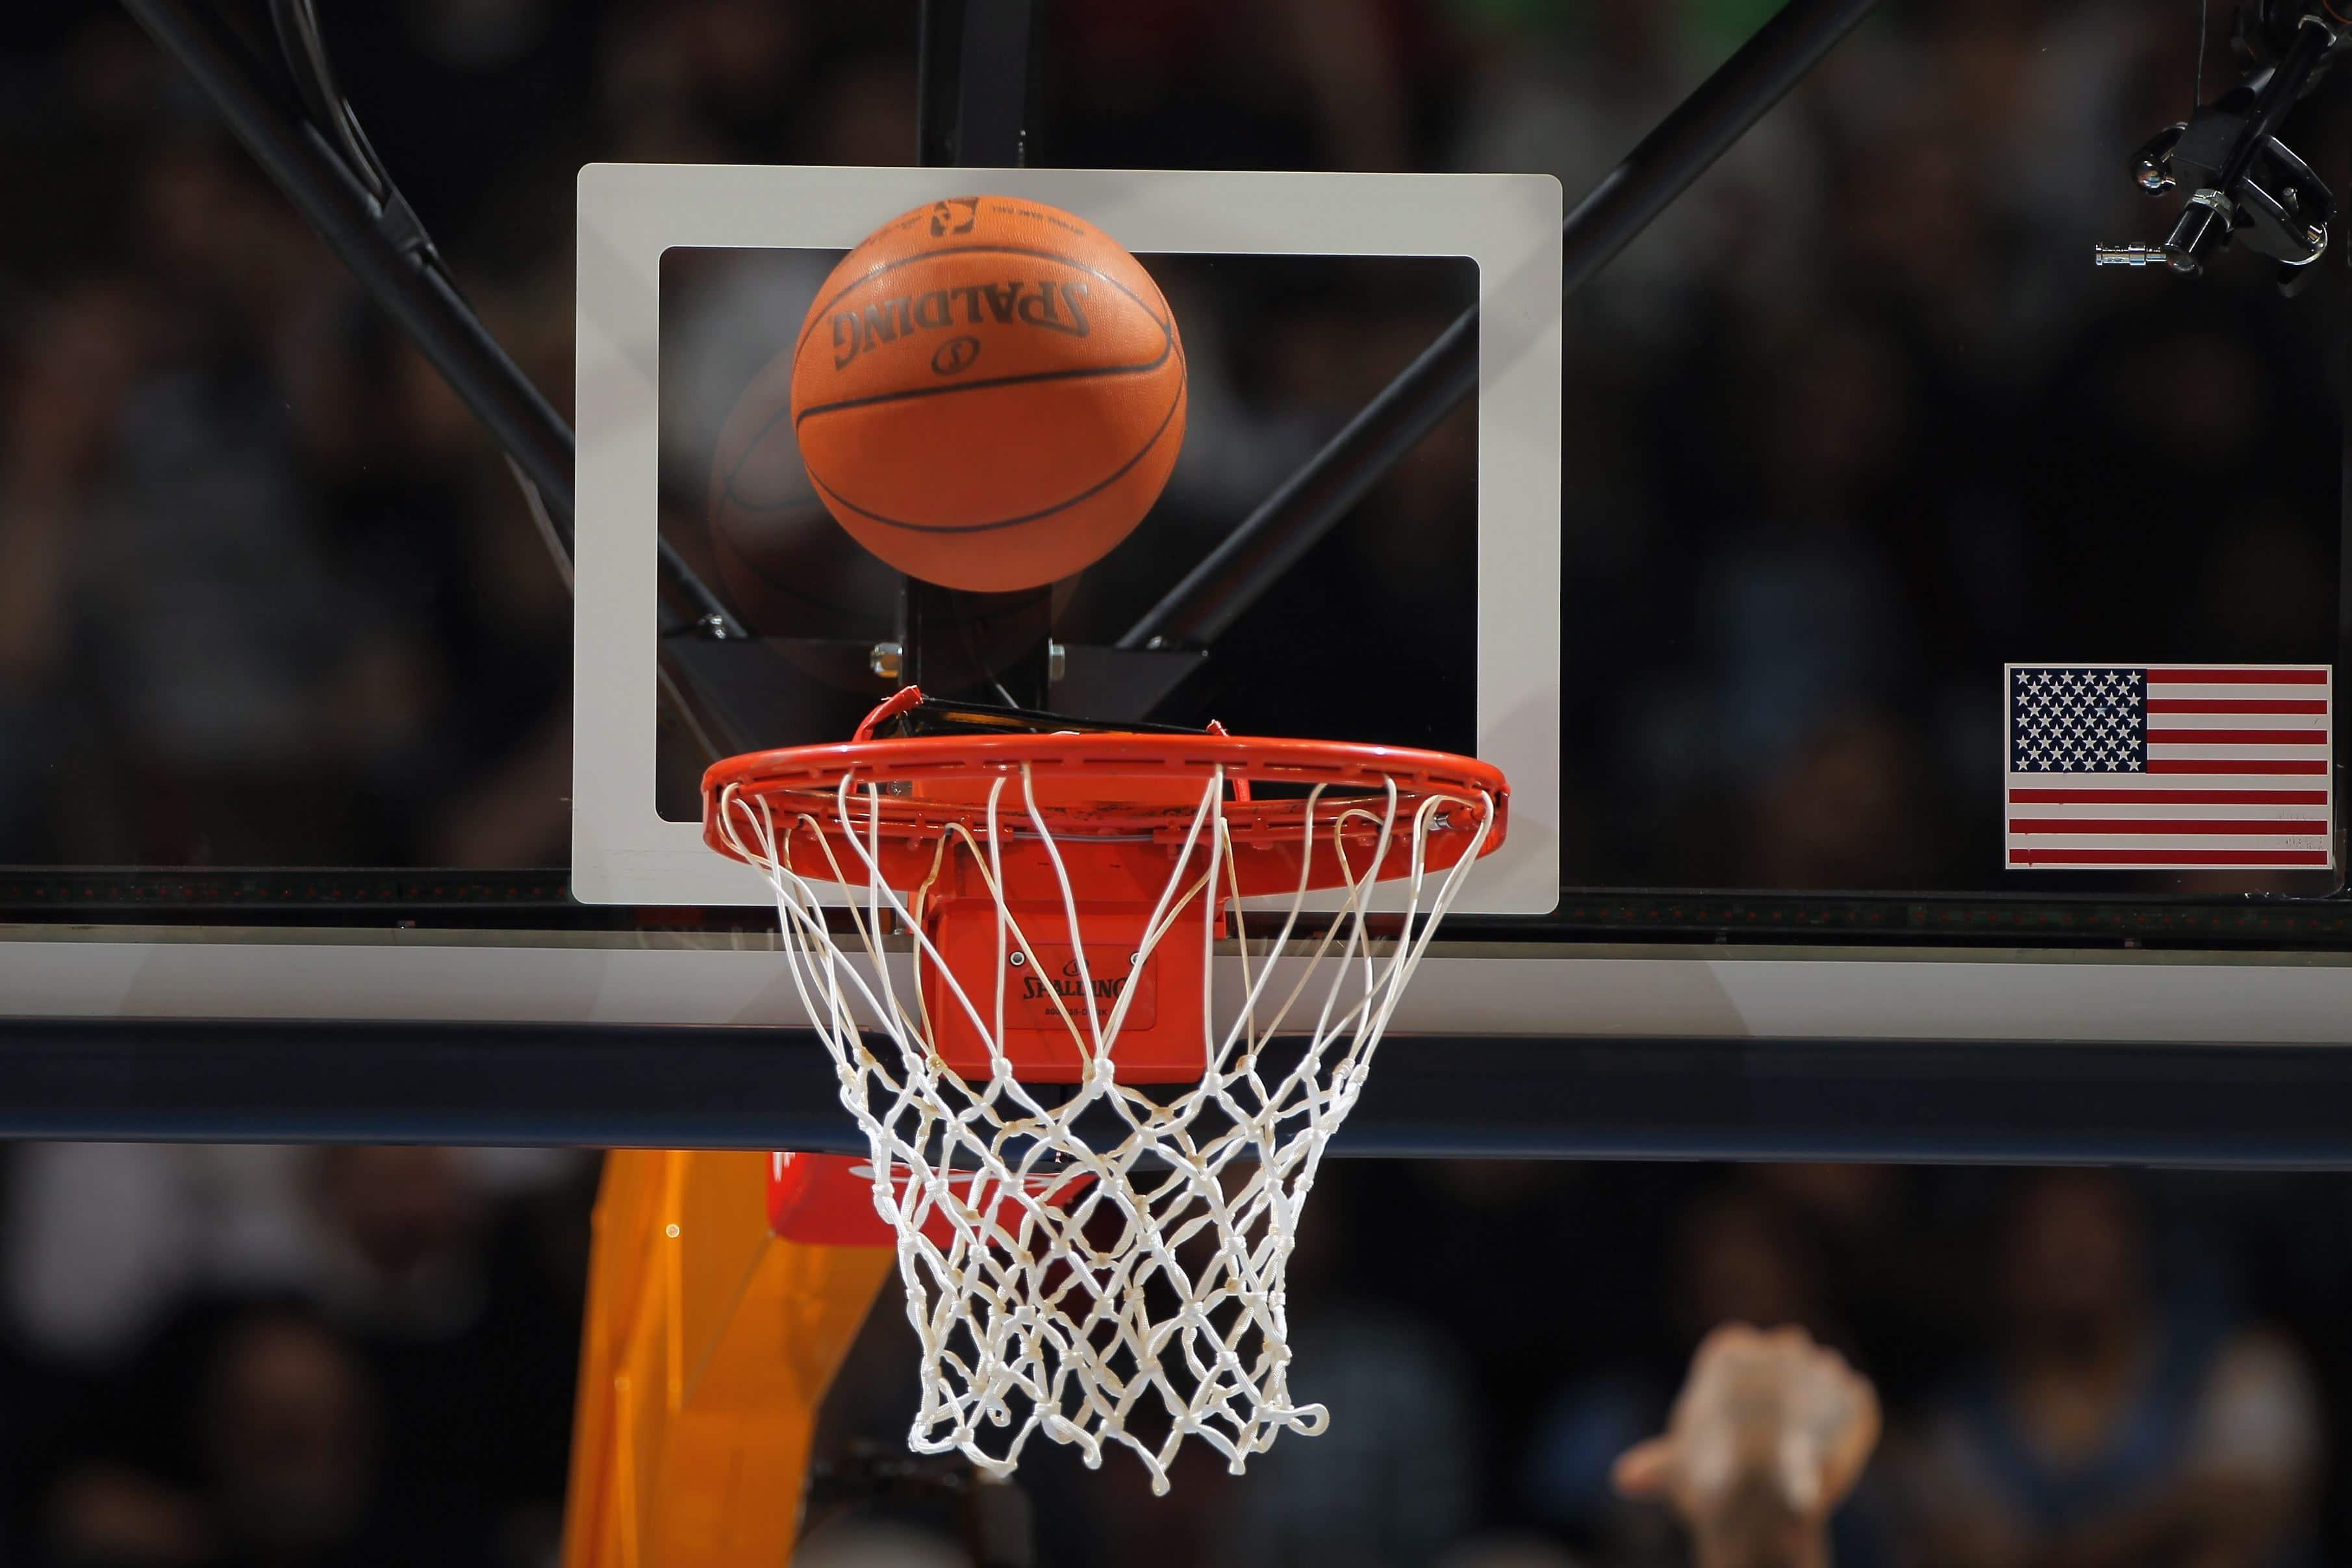 Best Nba Wallpapers Hd Nba Basketball Basket Www Pixshark Com Images